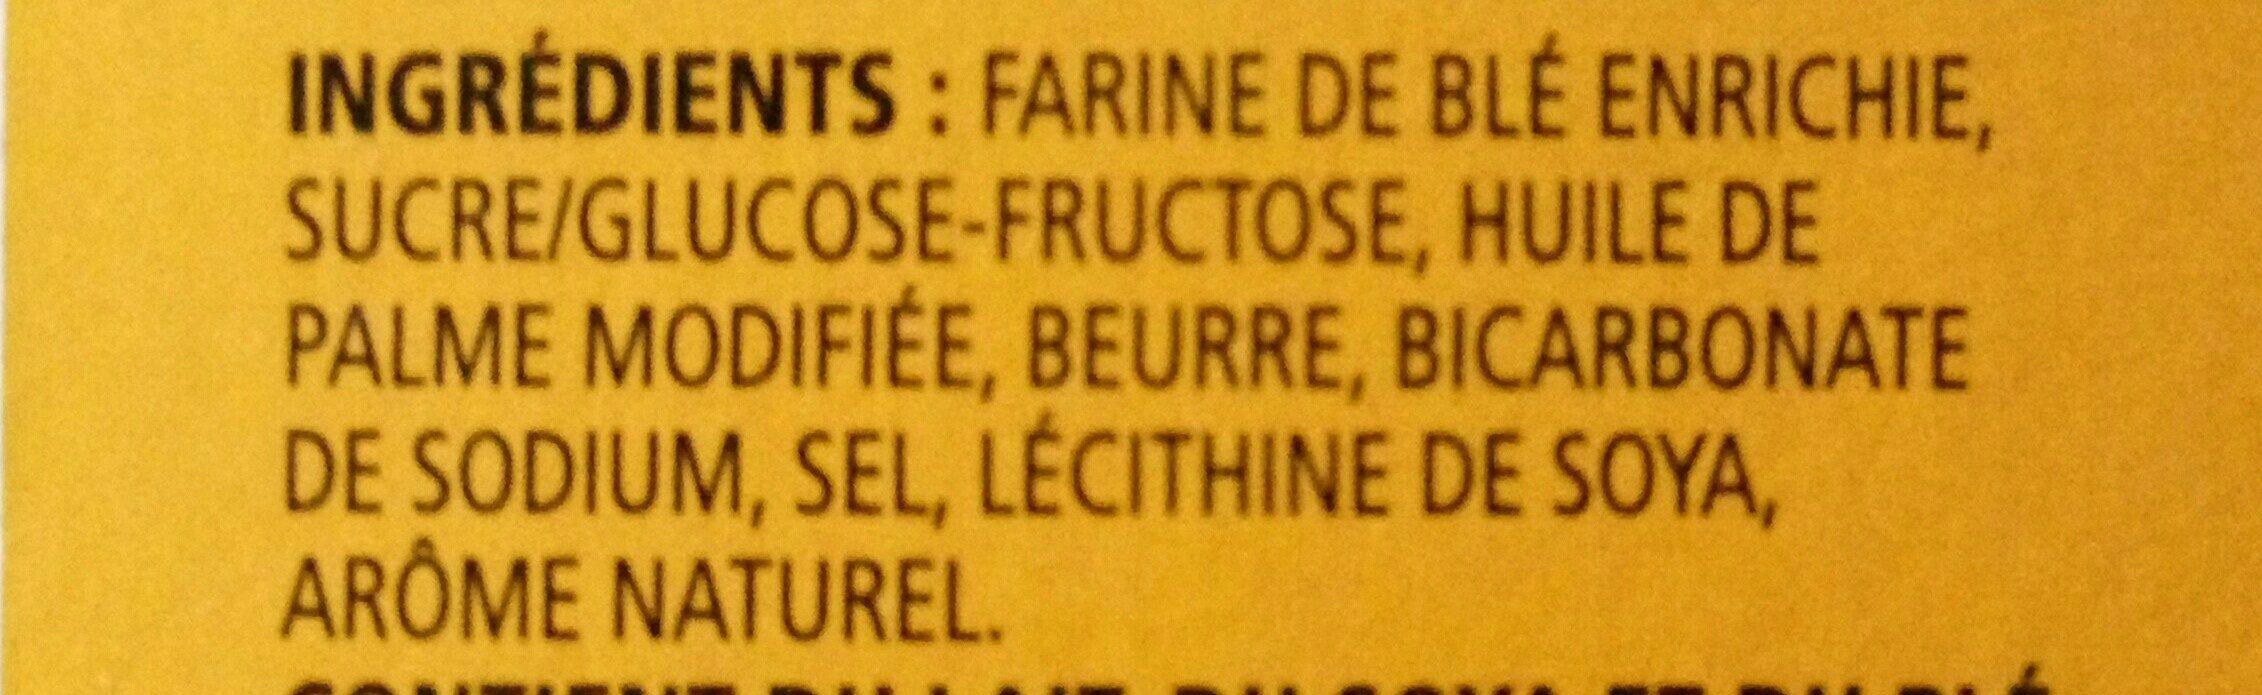 Petit beurre cookies - Ingrédients - fr